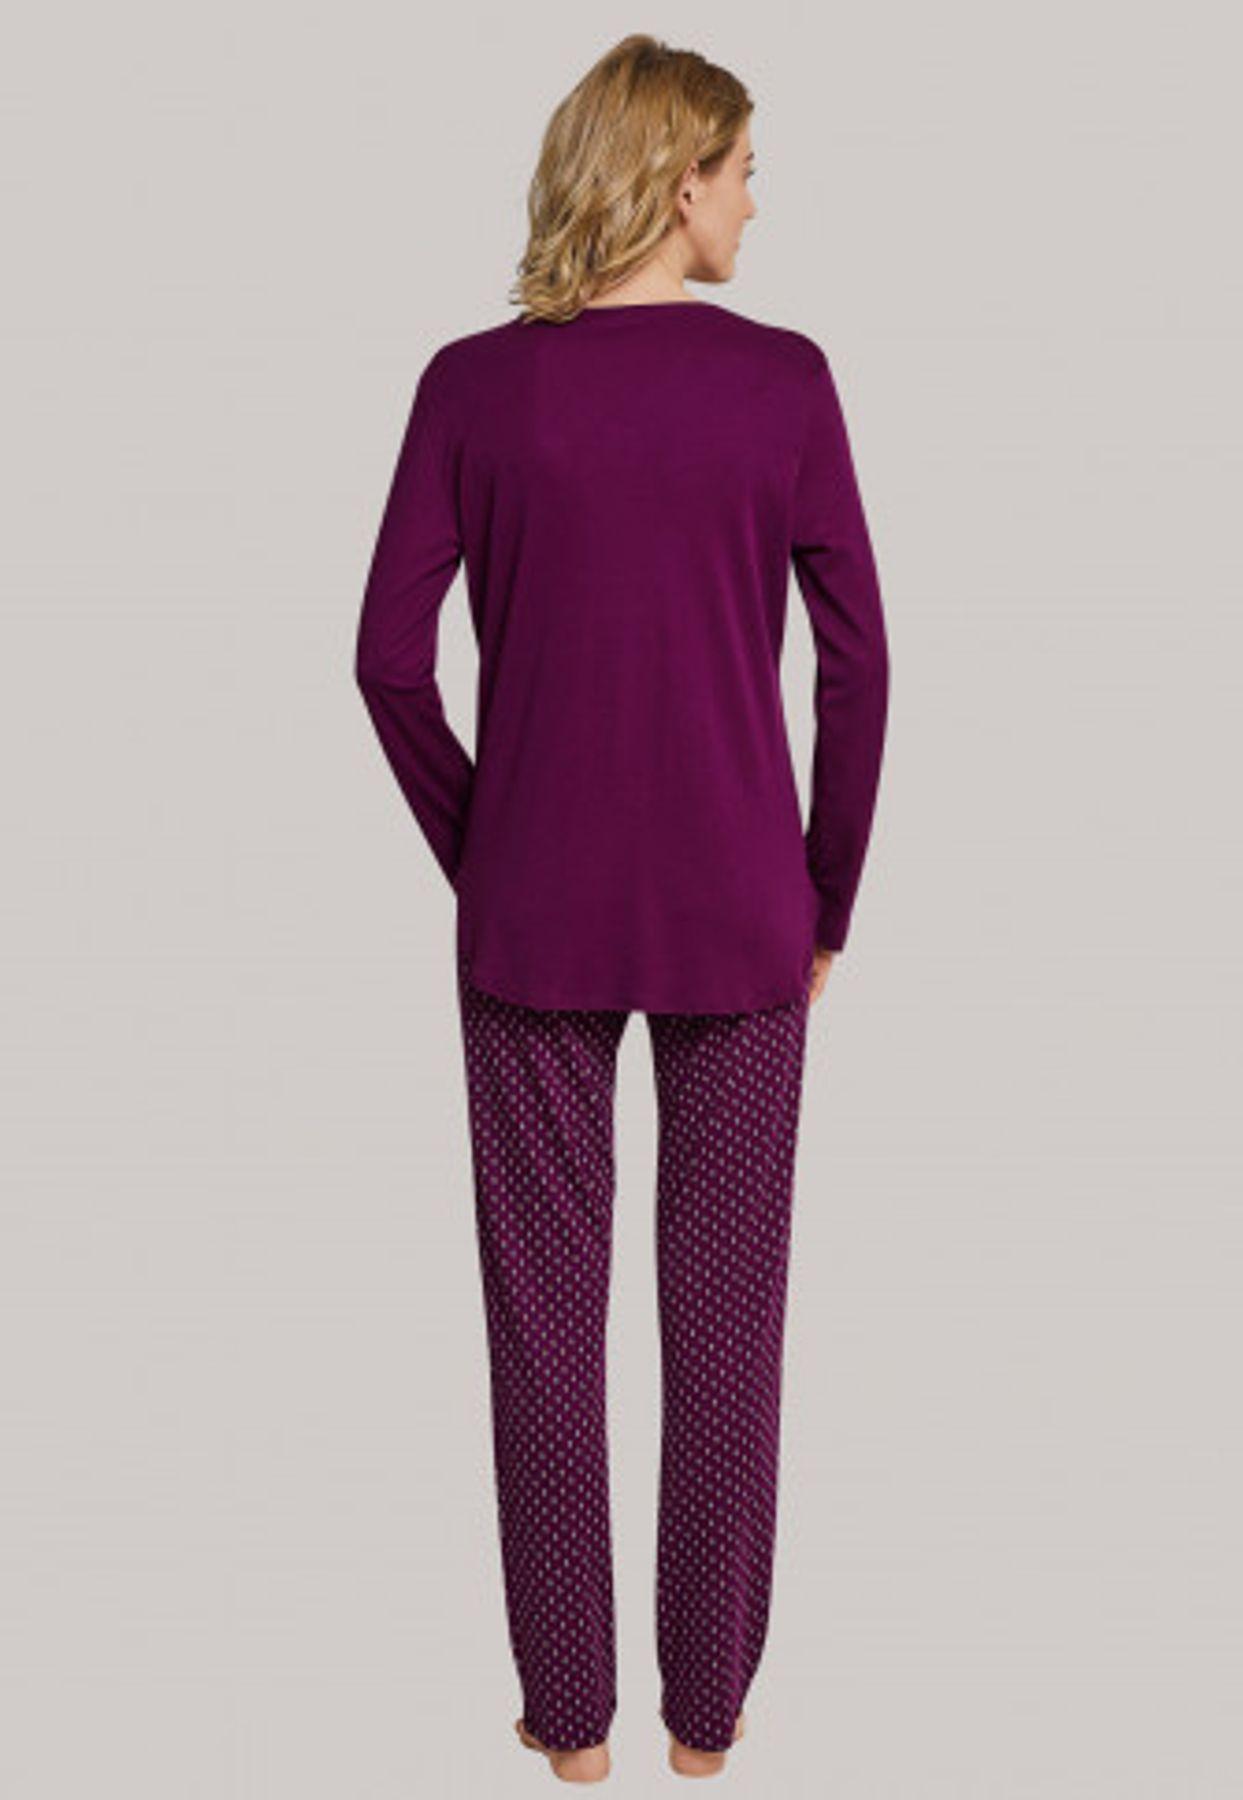 Schiesser - Damen Schlafanzug lang, bordeaux (163053-502) – Bild 2